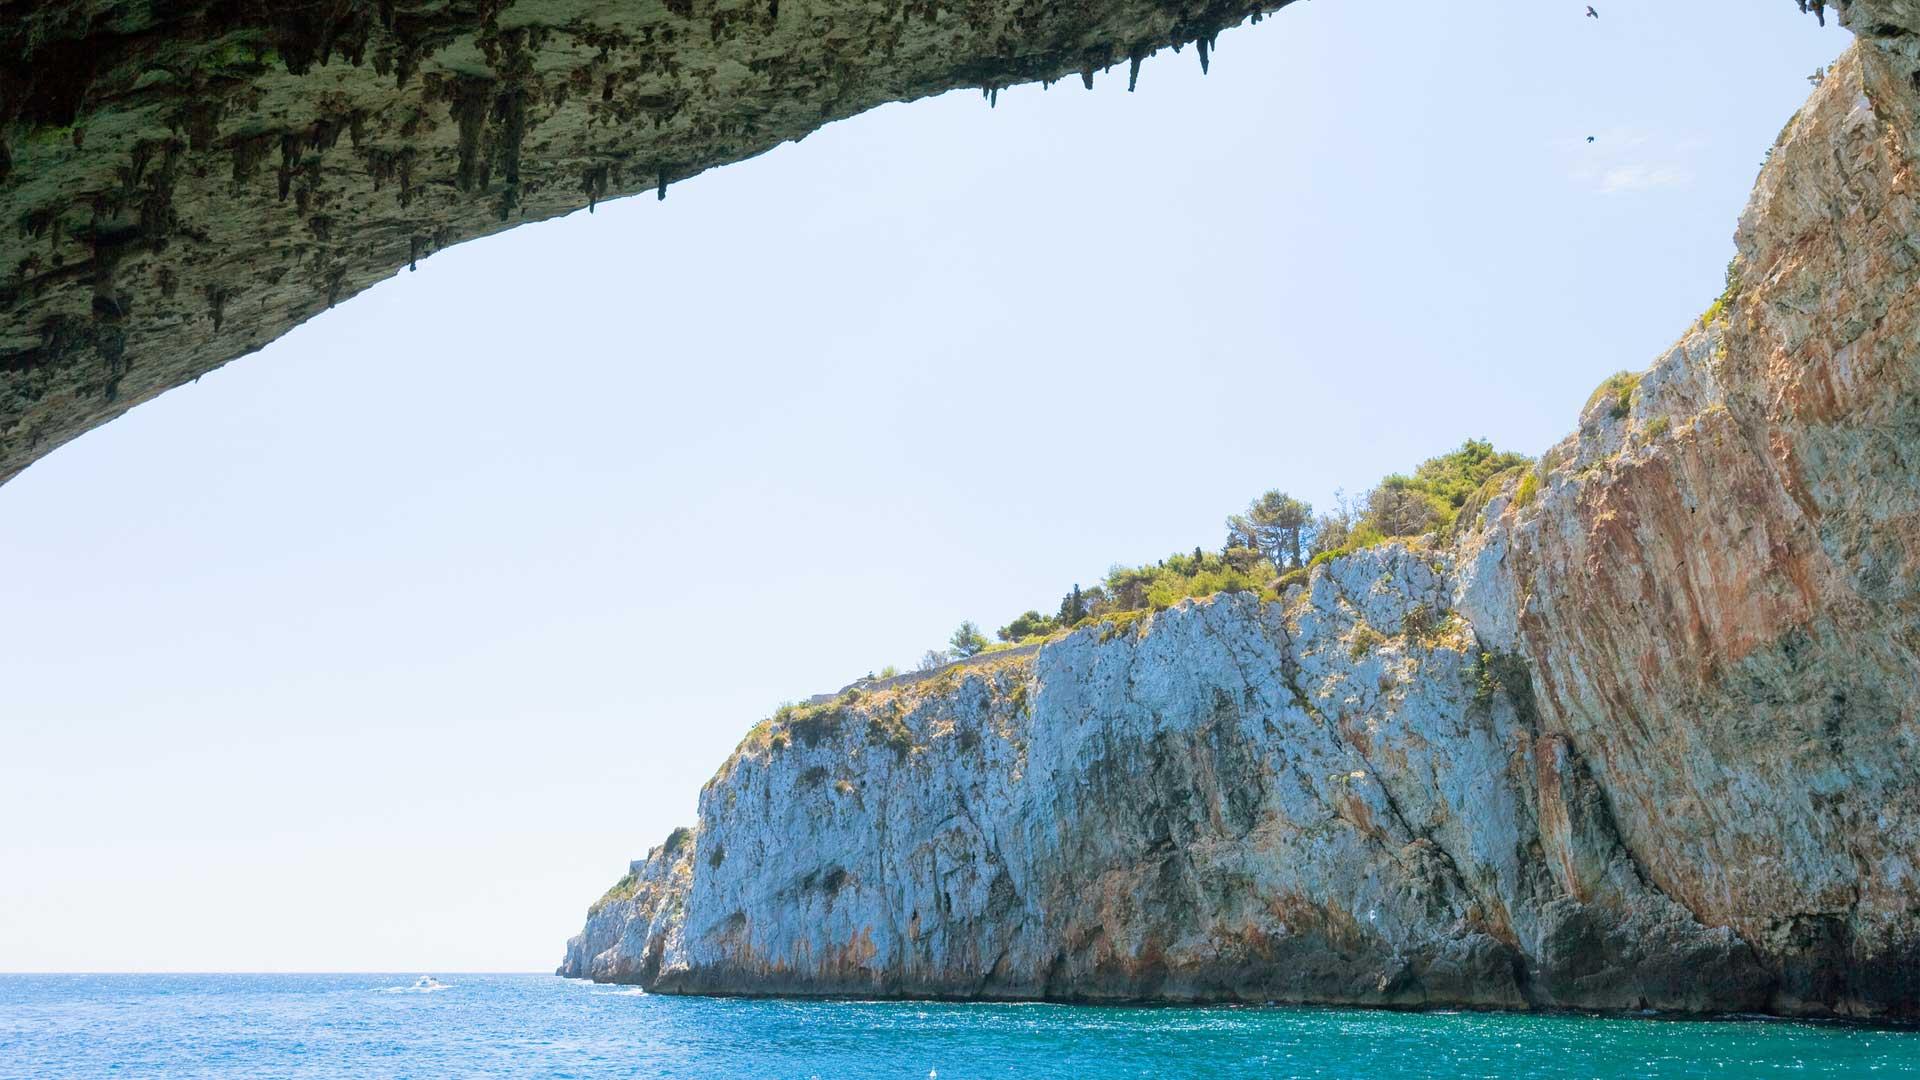 Grotta di Zinzulusa